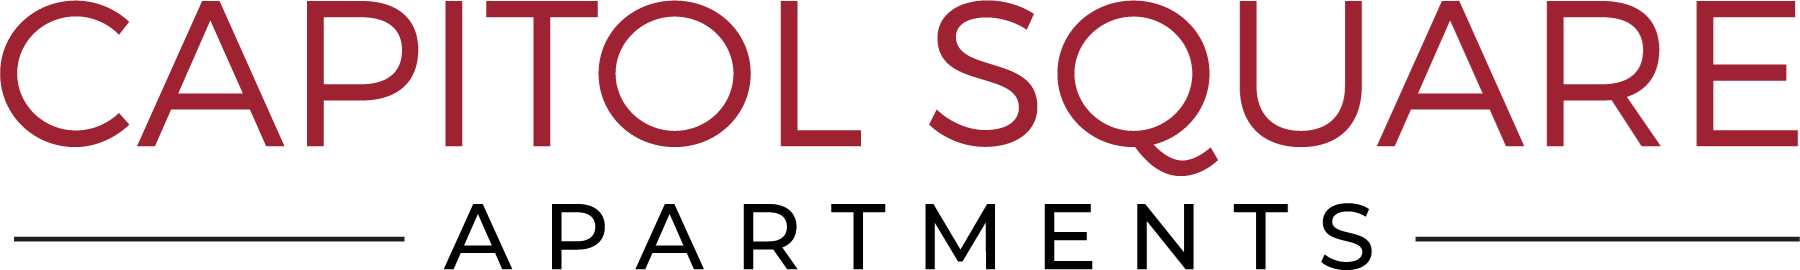 Brentwood Property Logo 1